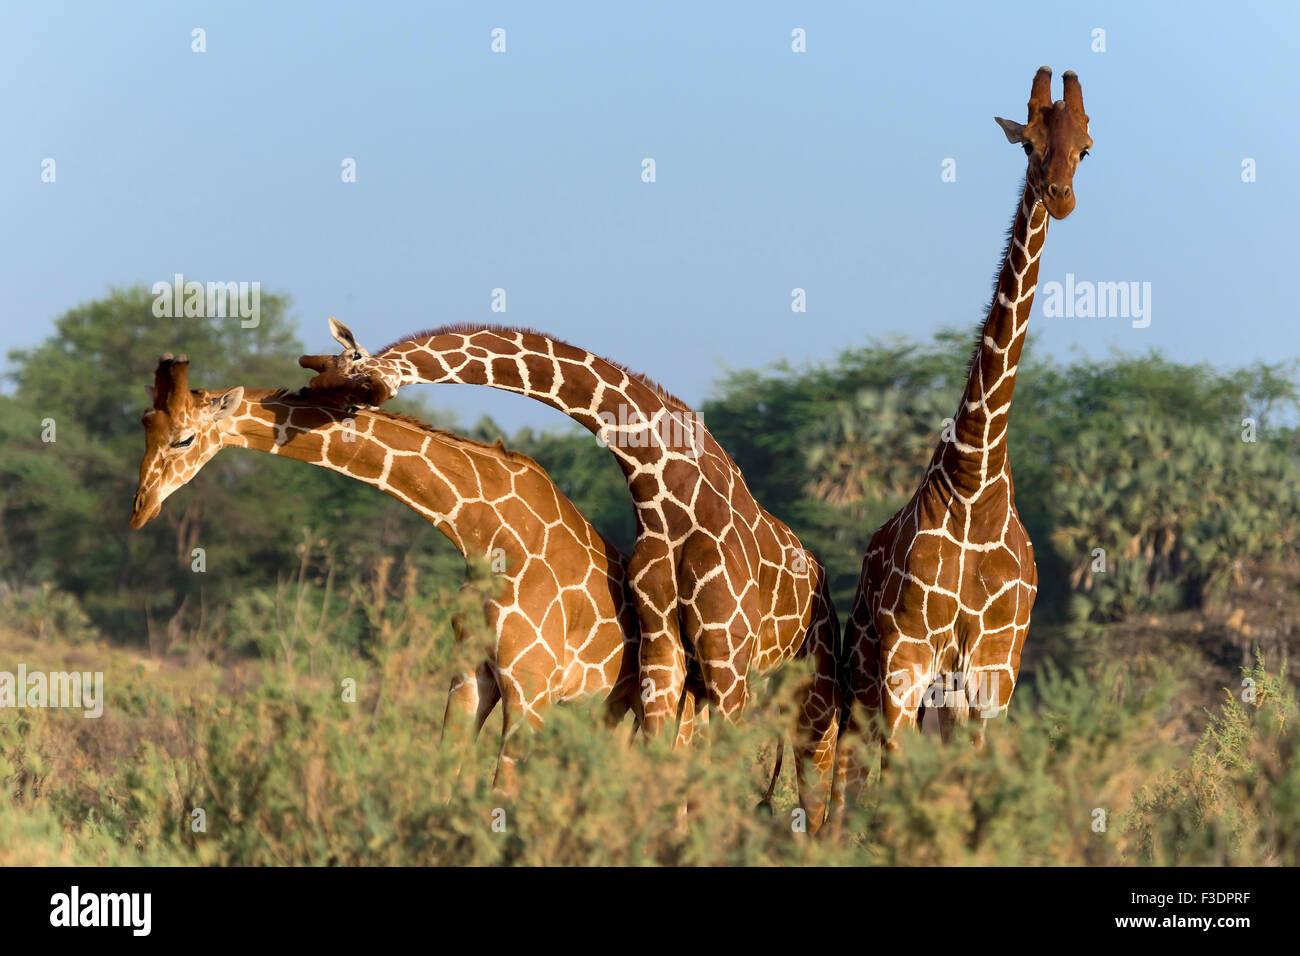 Trois girafes somaliens ou girafes Giraffa reticulata réticulée (girafe), Samburu National Reserve, Kenya Banque D'Images